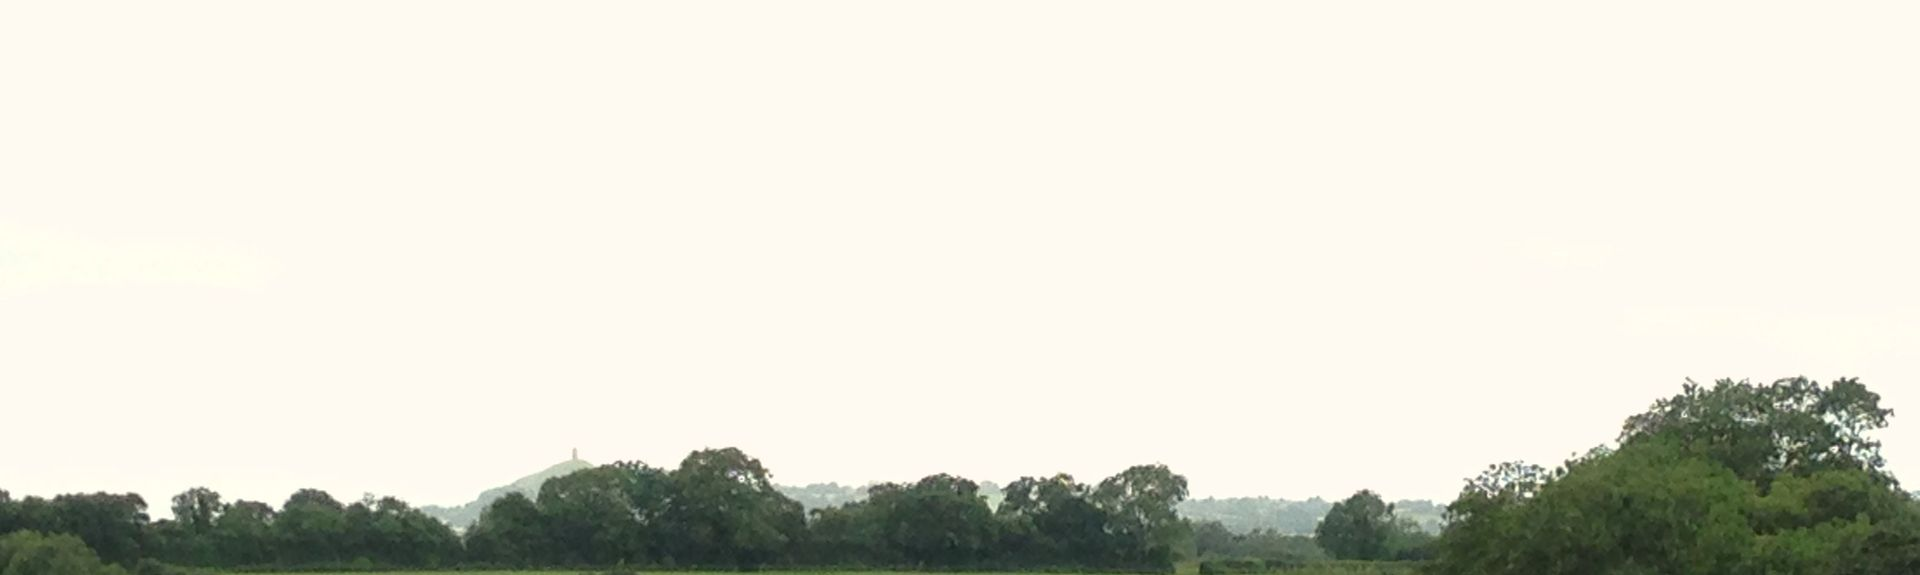 Somerton, Englanti, Yhdistynyt Kuningaskunta